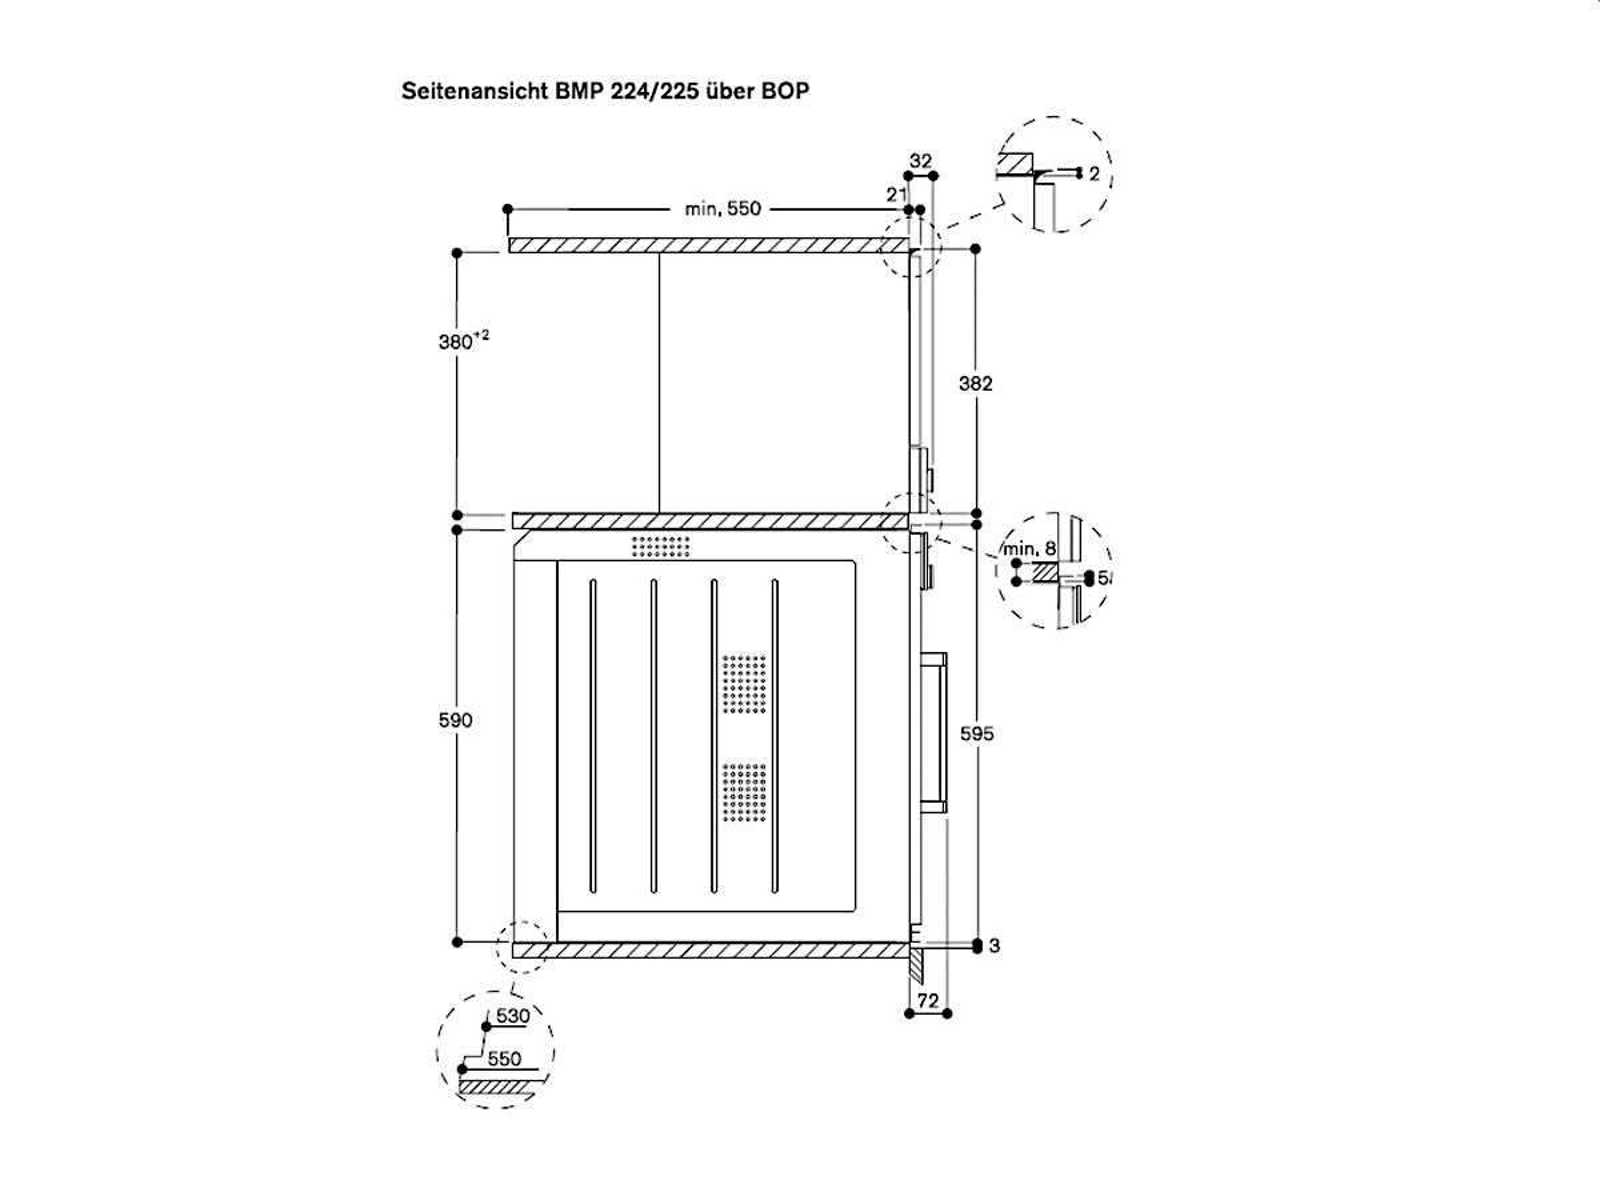 Gaggenau BMP 225 100 Einbau-Mikrowelle Serie 200 Anthrazit